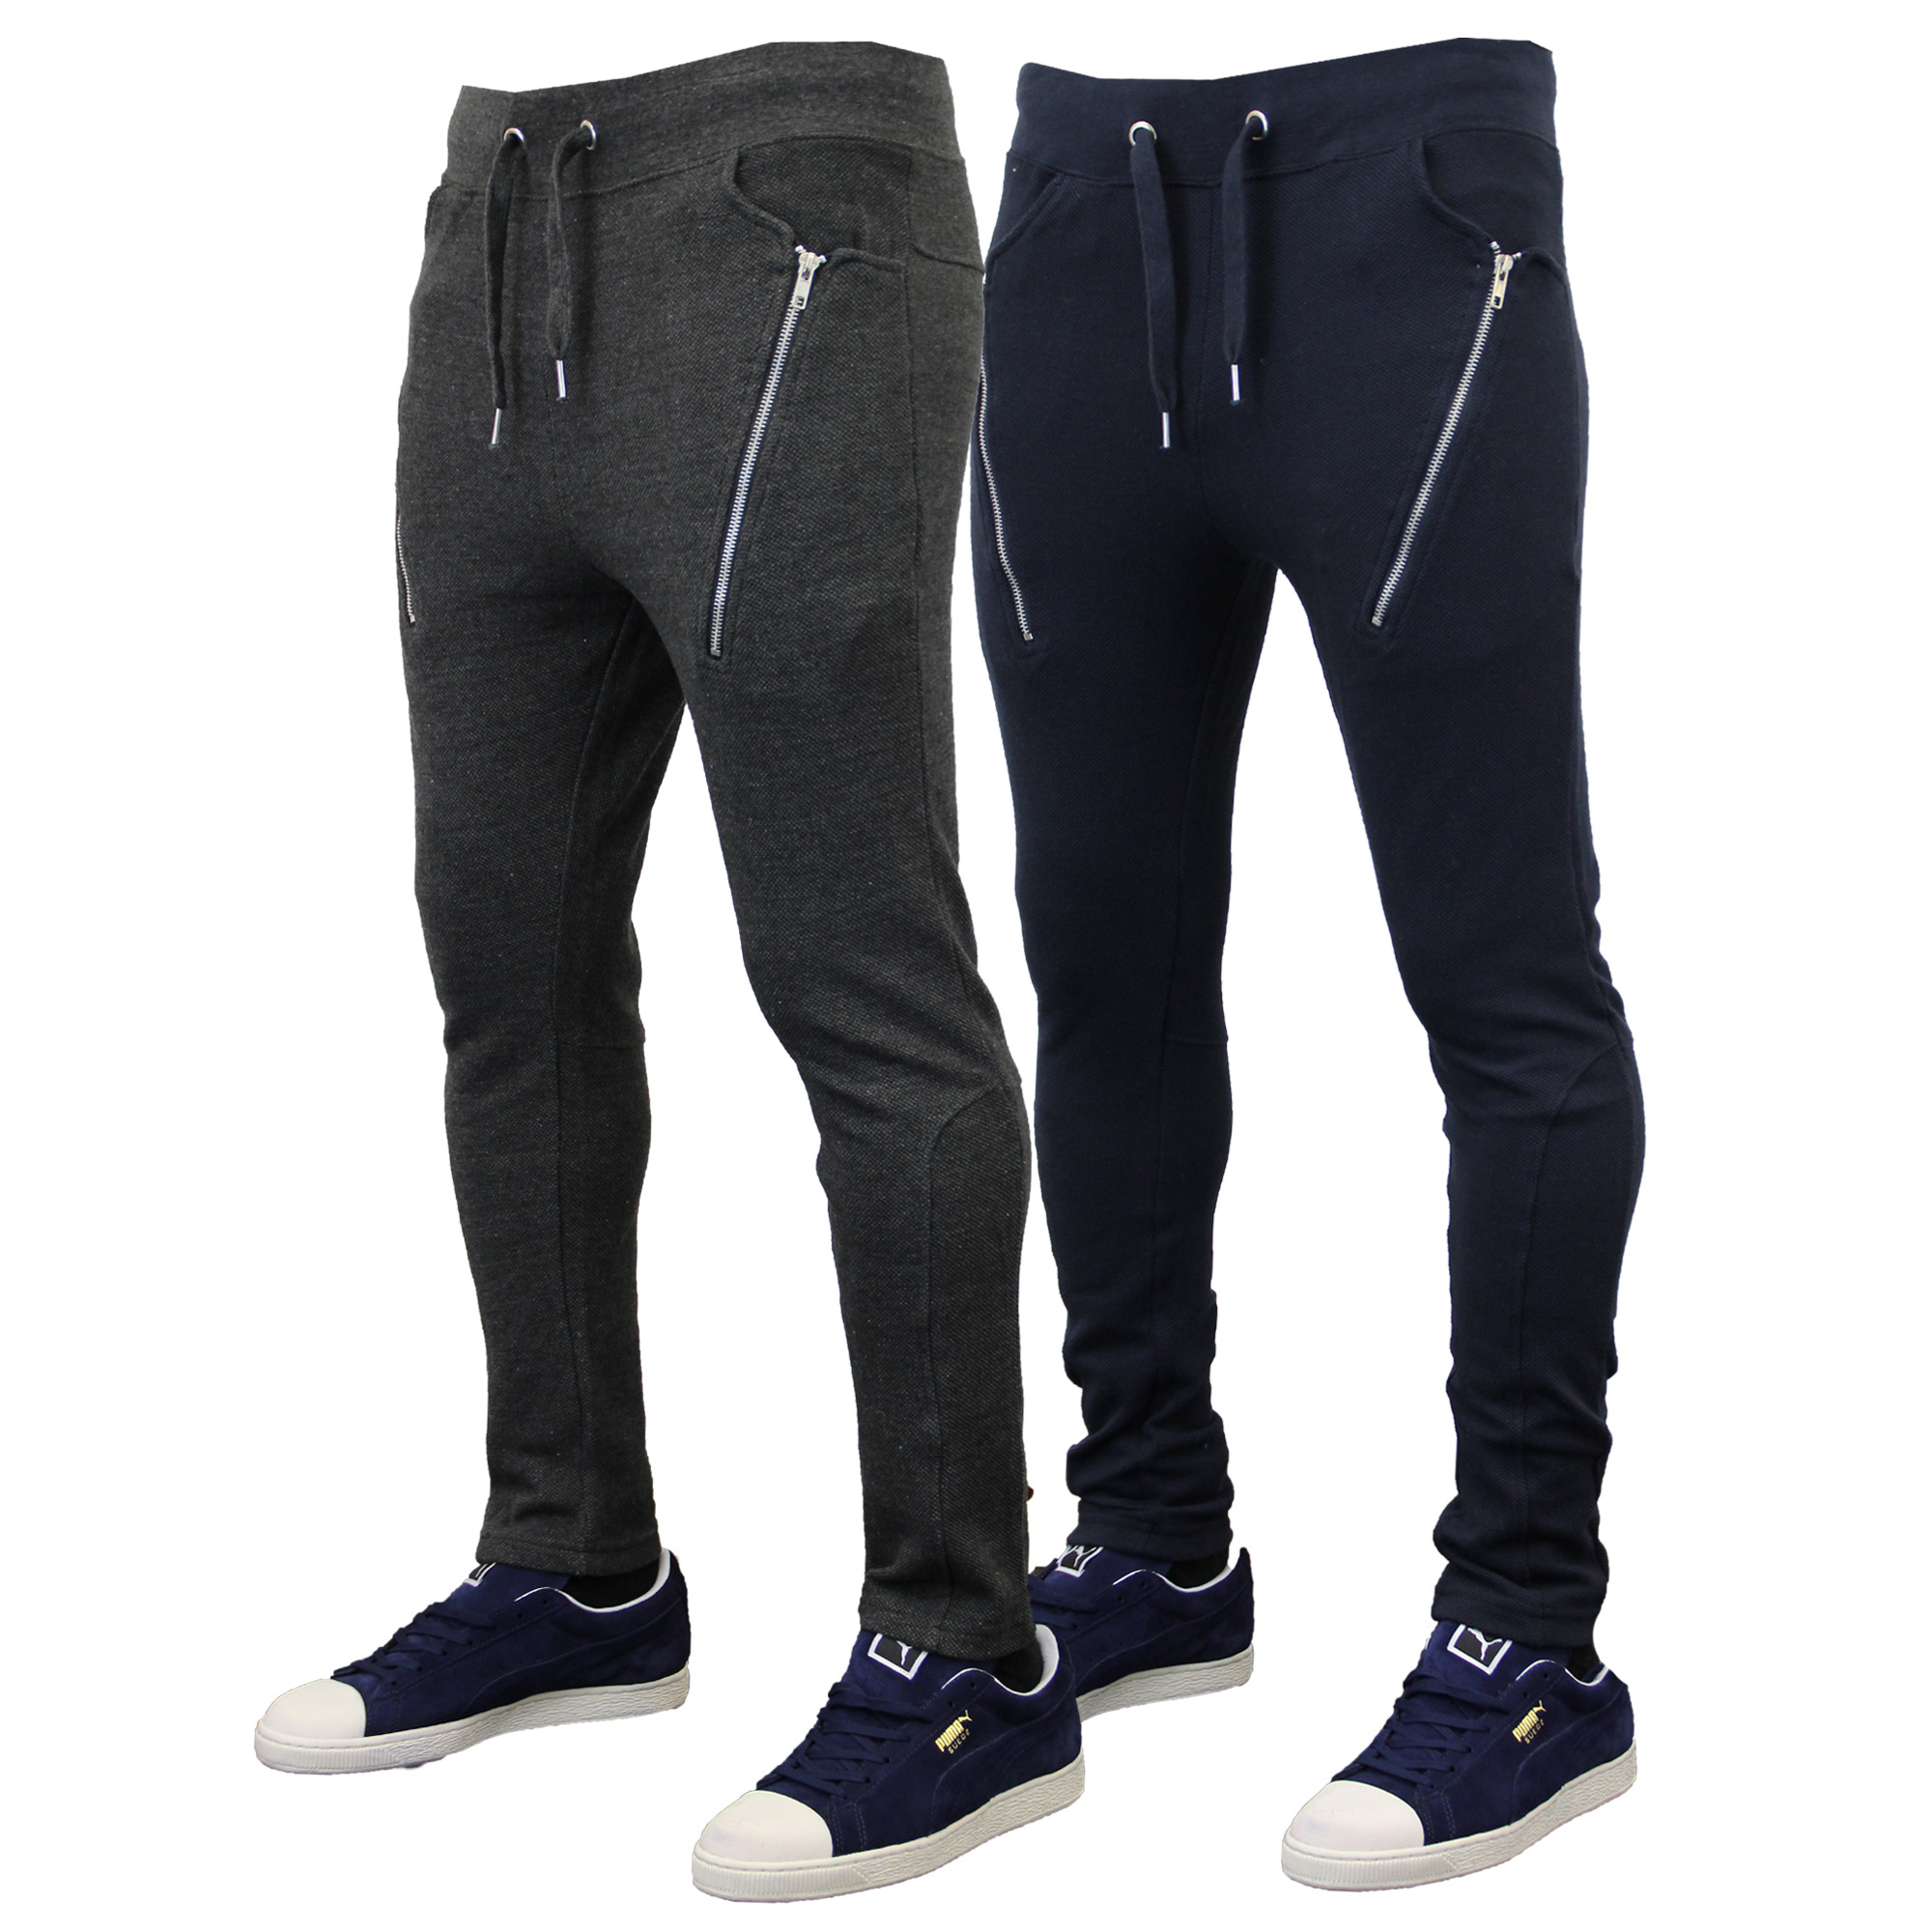 be1d97242 workout jogger pants